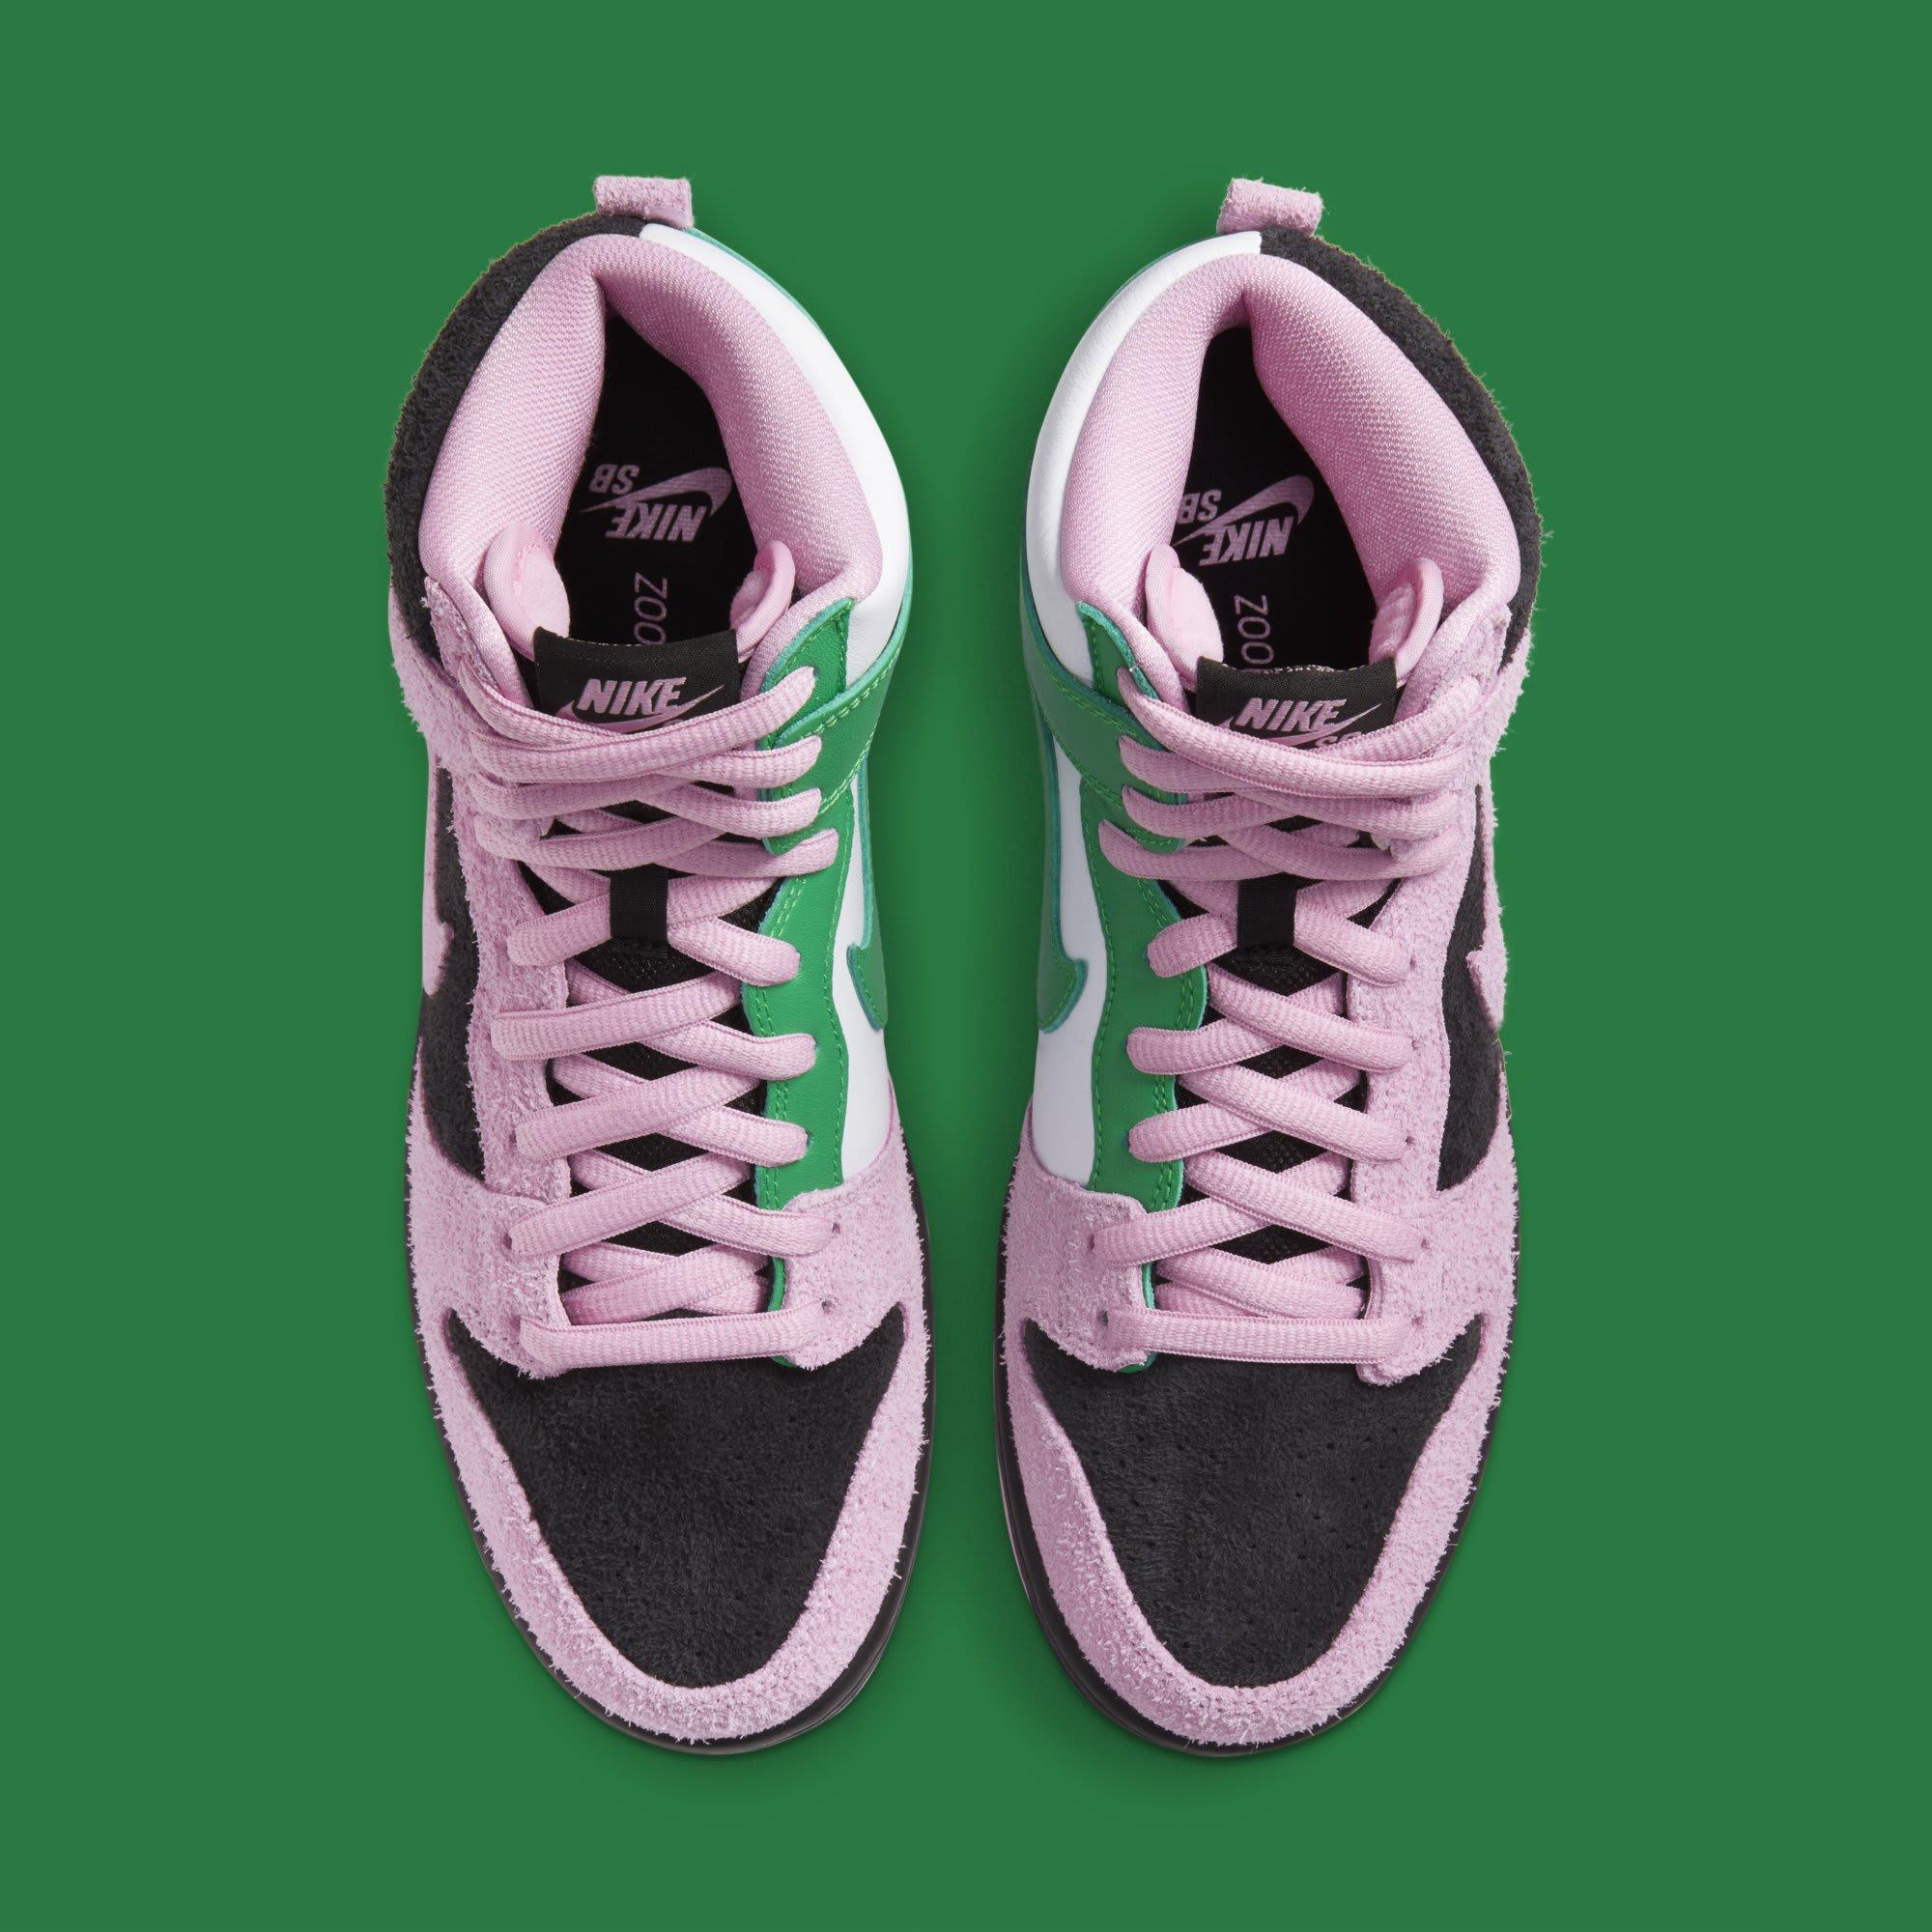 Nike SB Dunk High 'Invert Celtics' CU7349-001 Top